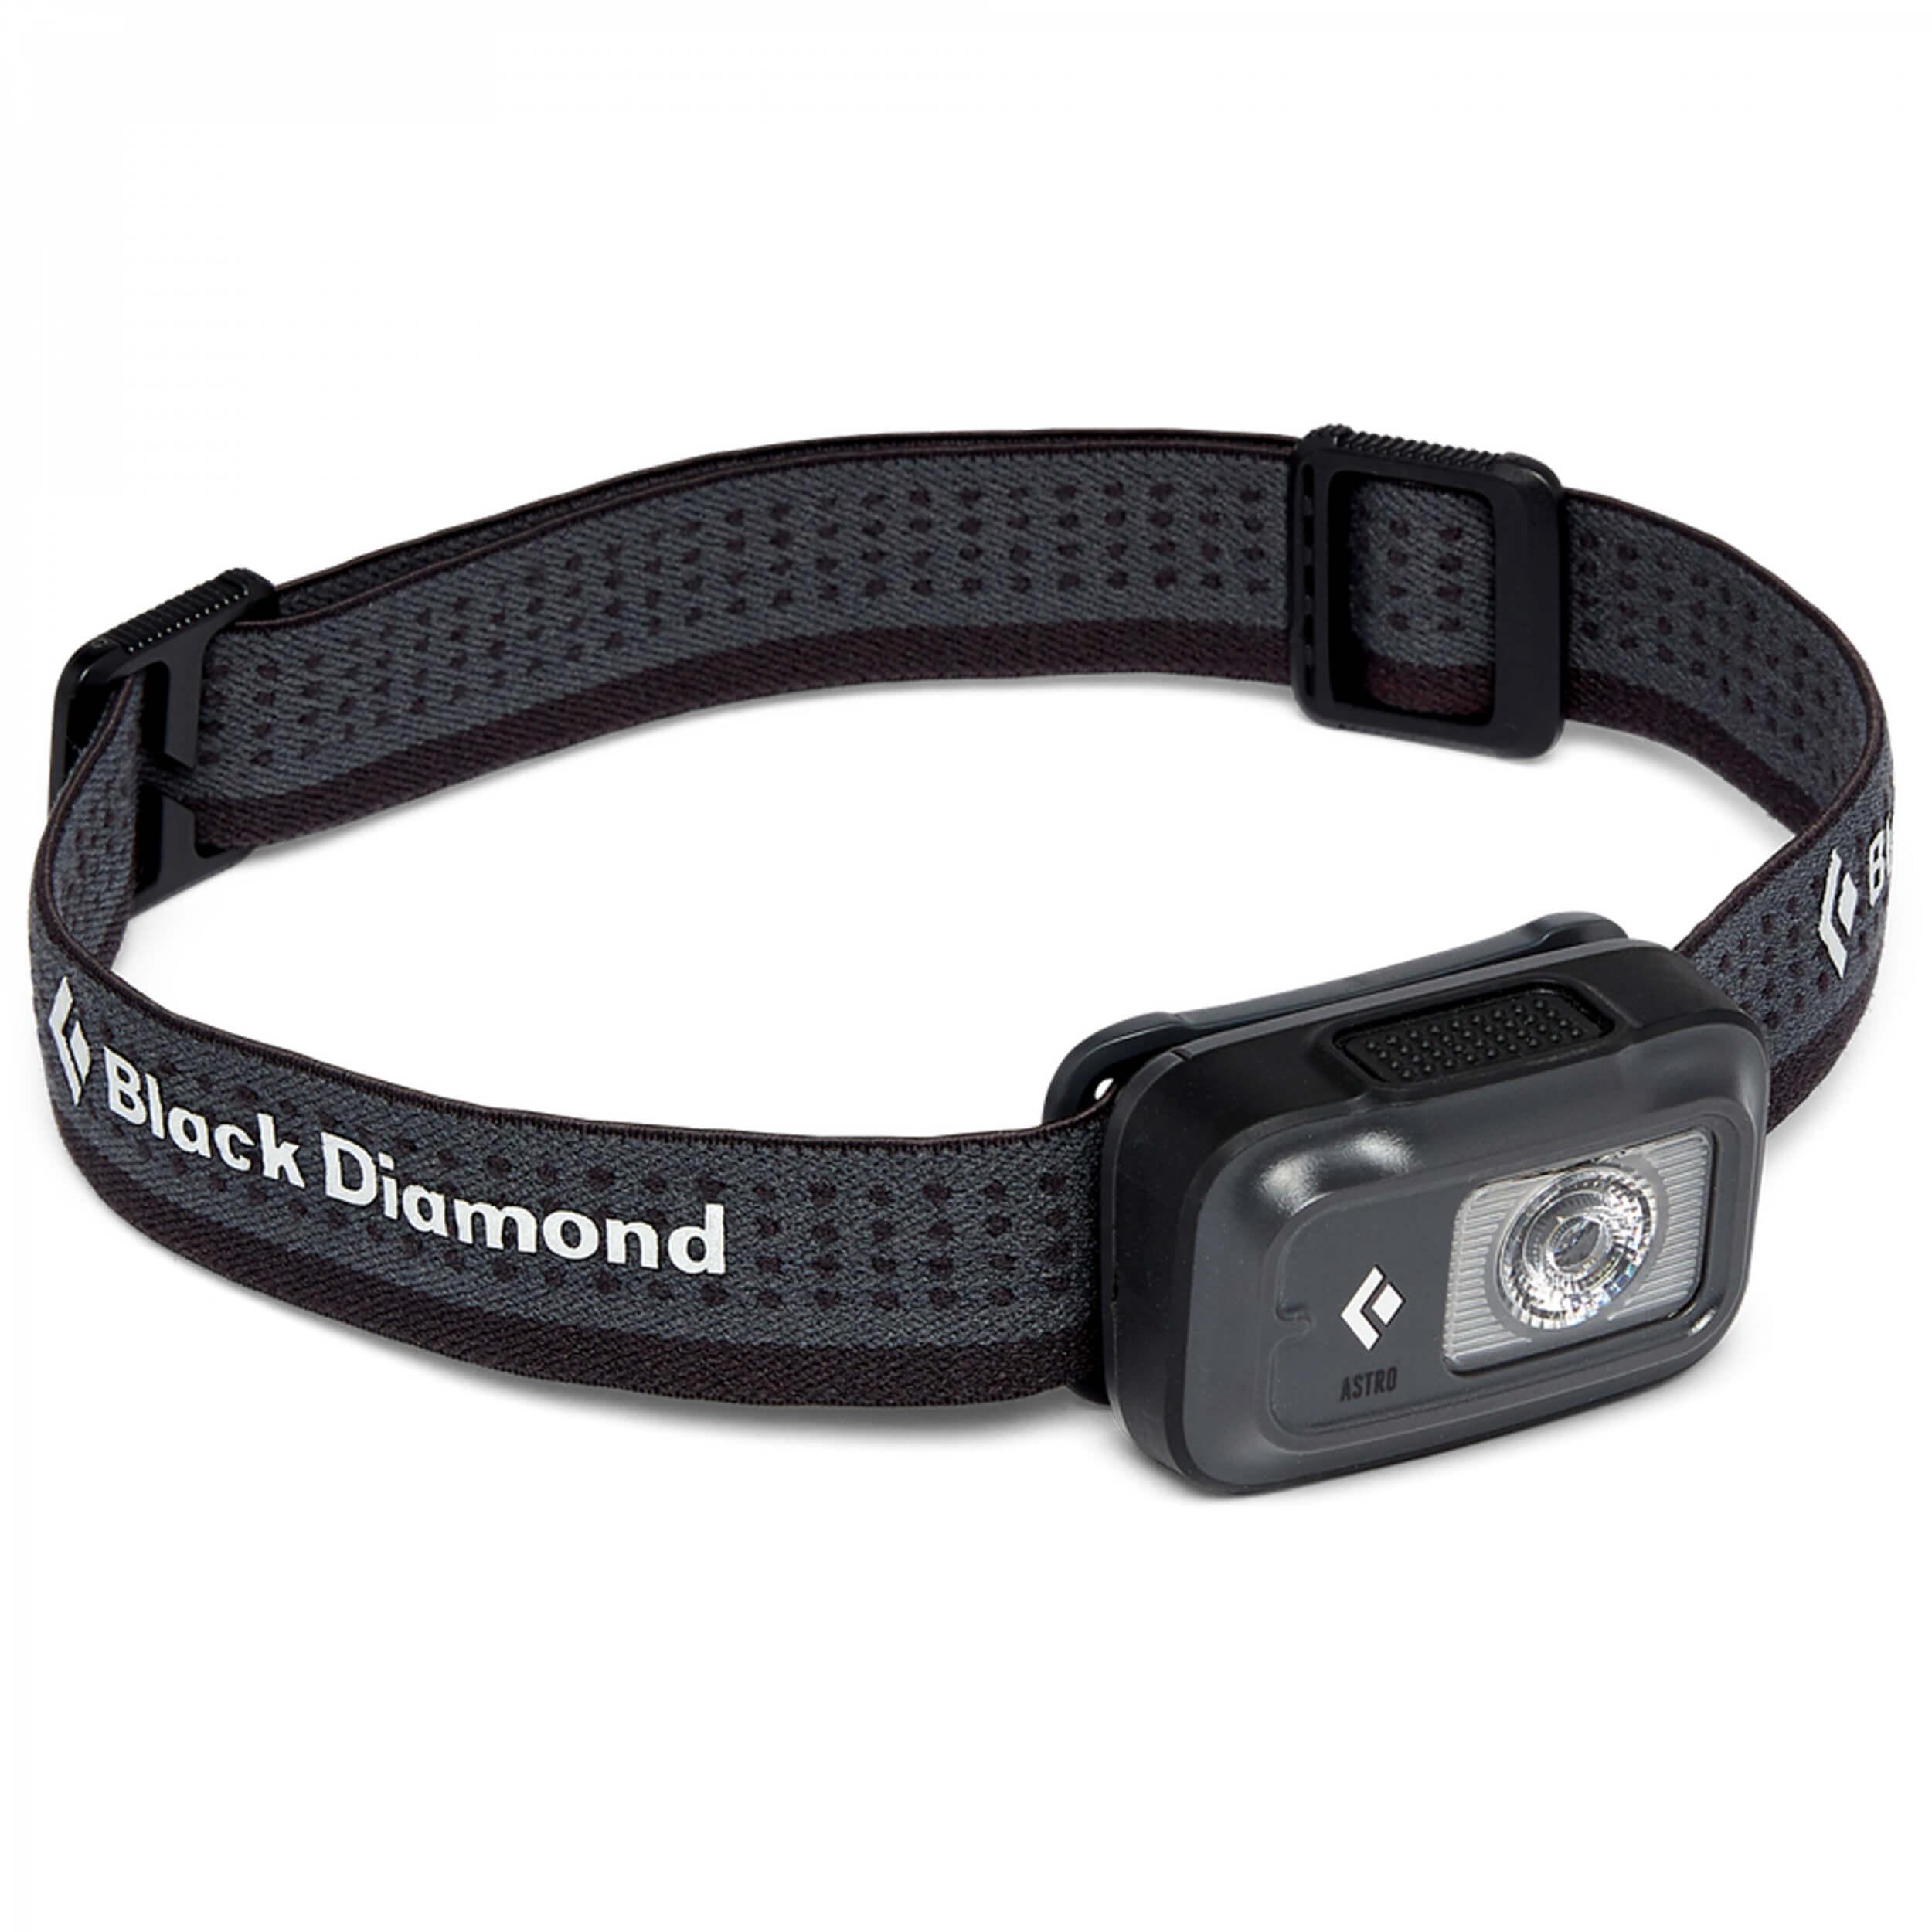 Black Diamond Astro 250 Headlamp graphite